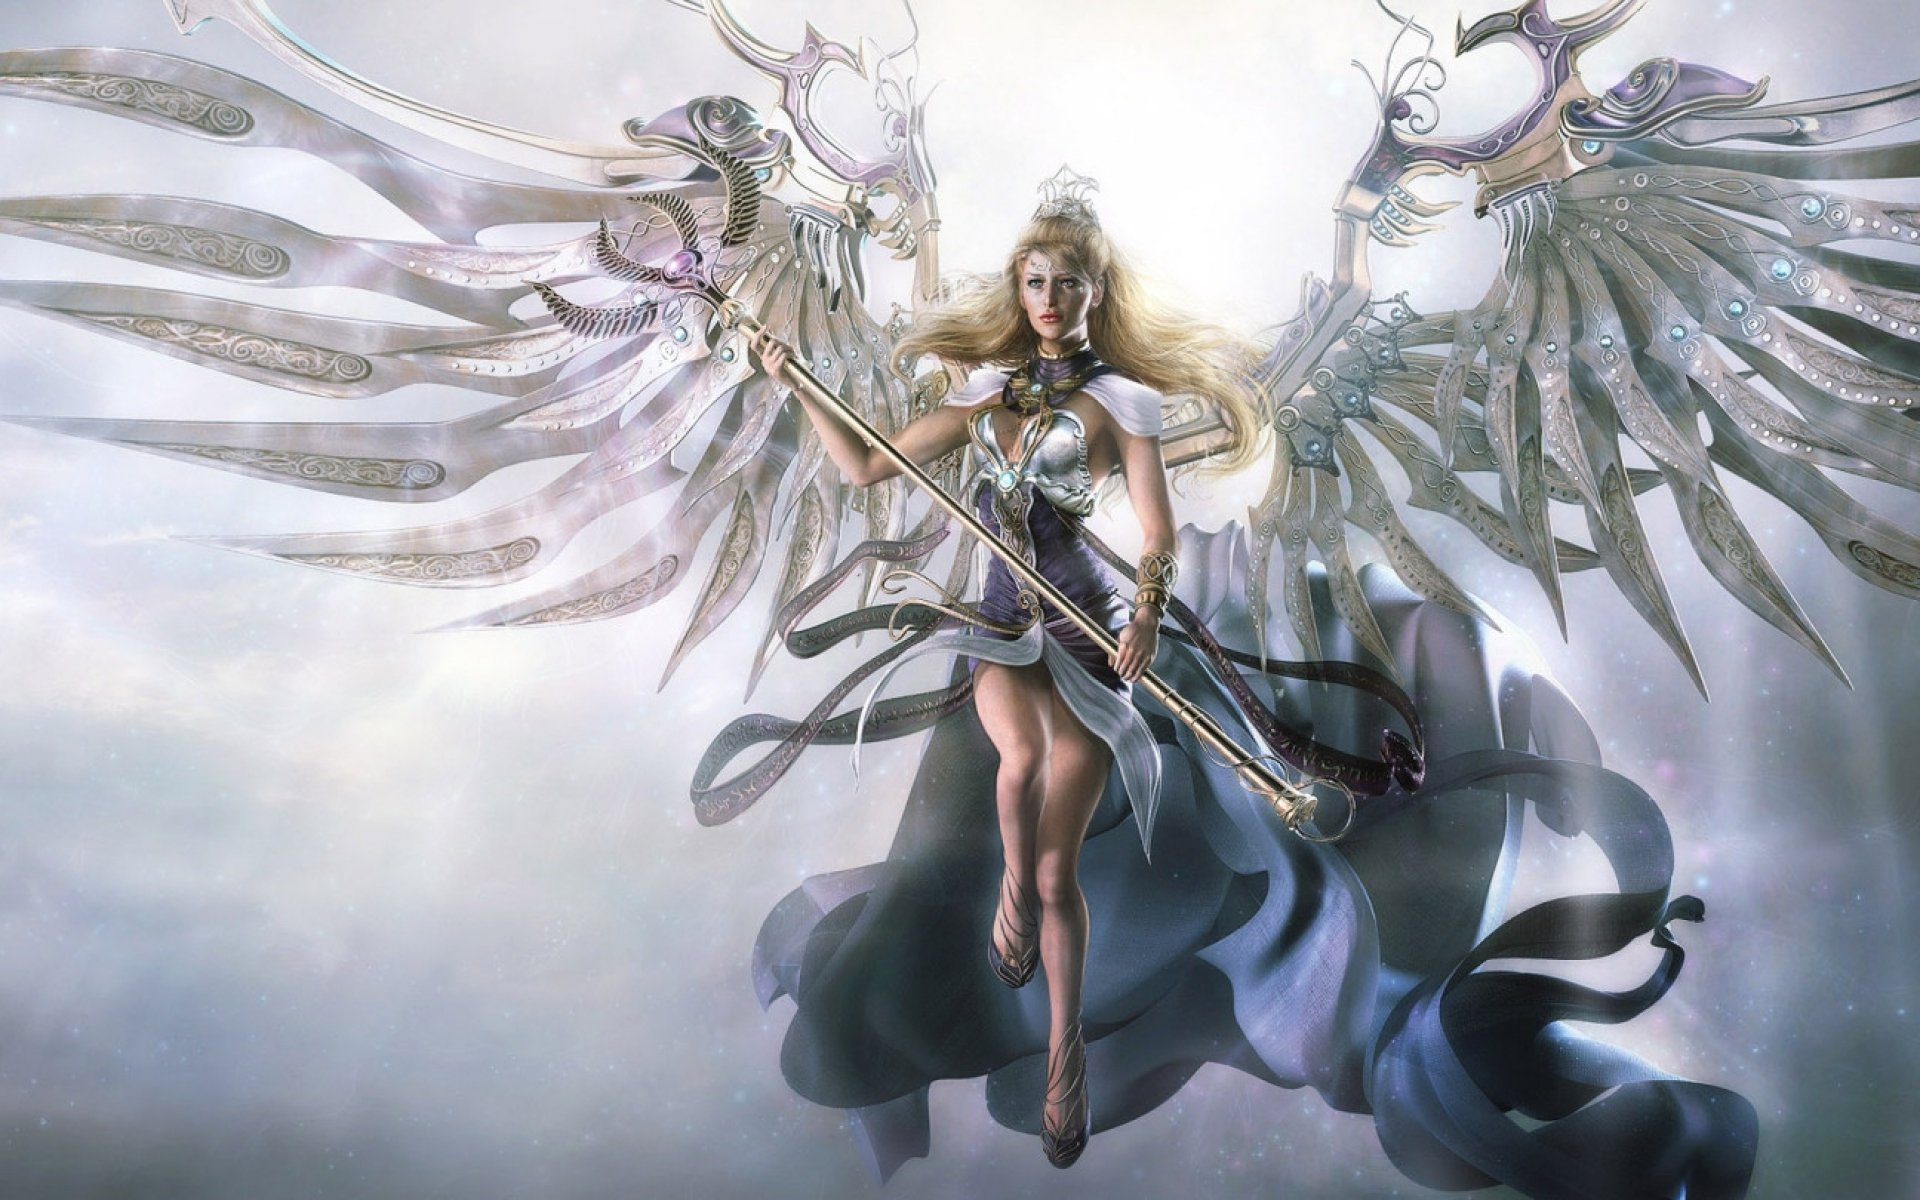 Fantasy angel warrior artwork art wallpaper | 1920x1200 ...